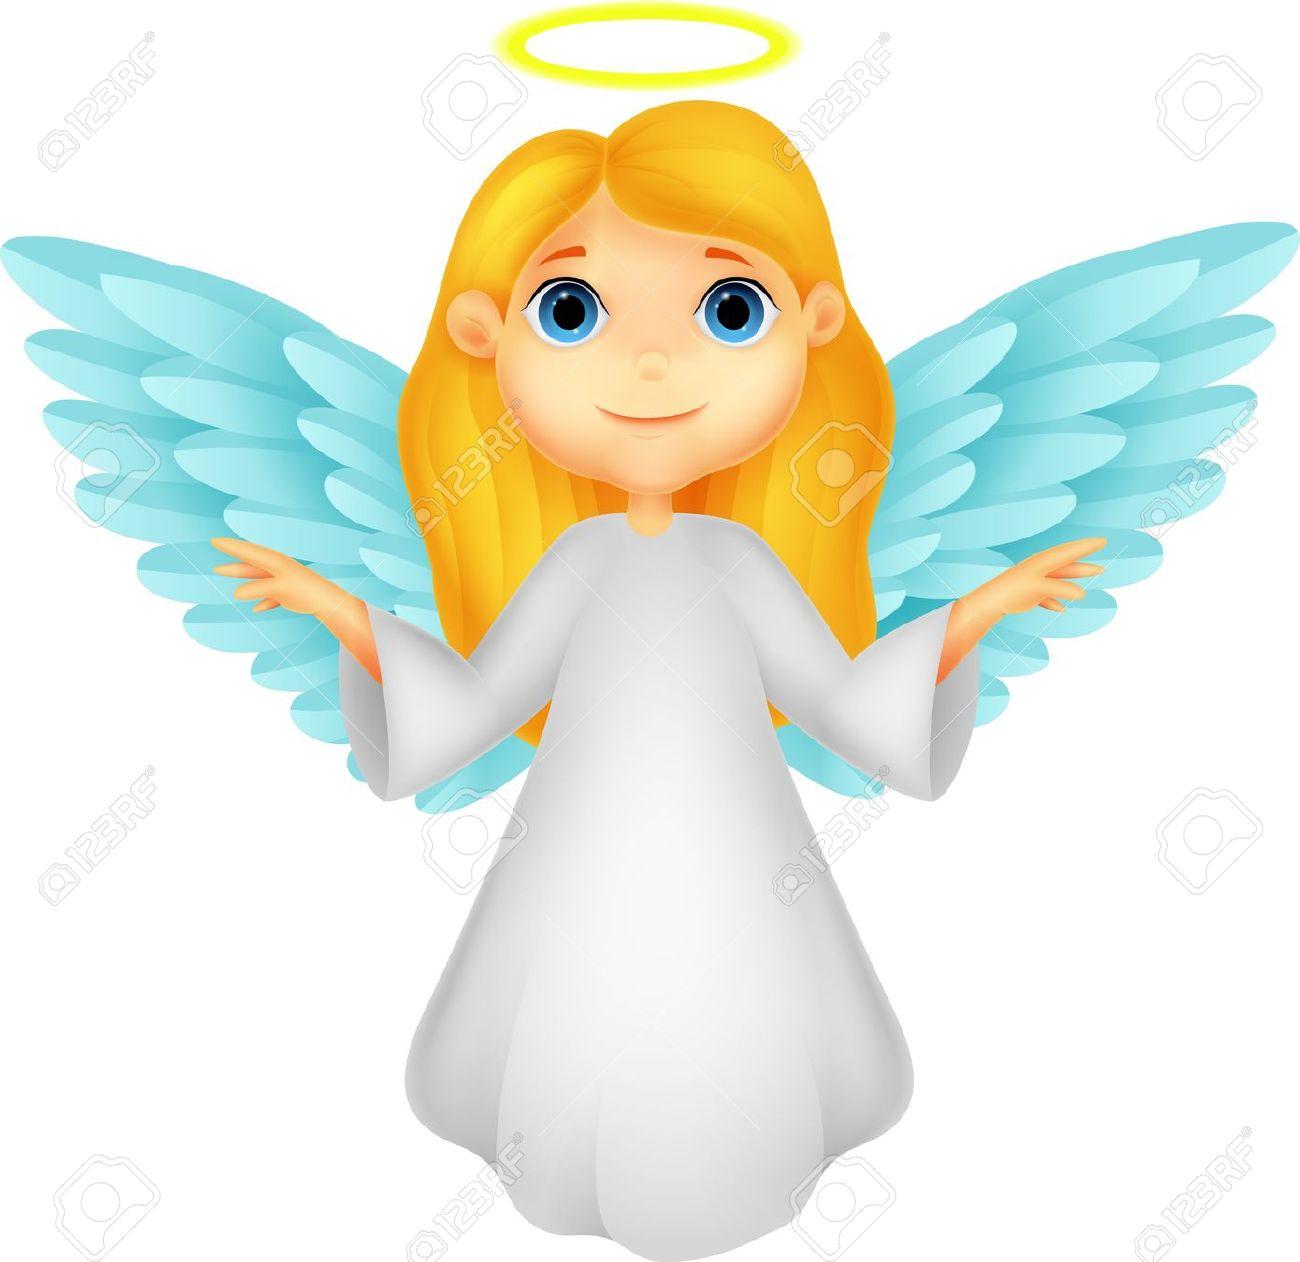 20754058-Cute-angel-cartoon--Stock-Vecto-20754058-Cute-angel-cartoon--Stock-Vector-christmas.jpg-0